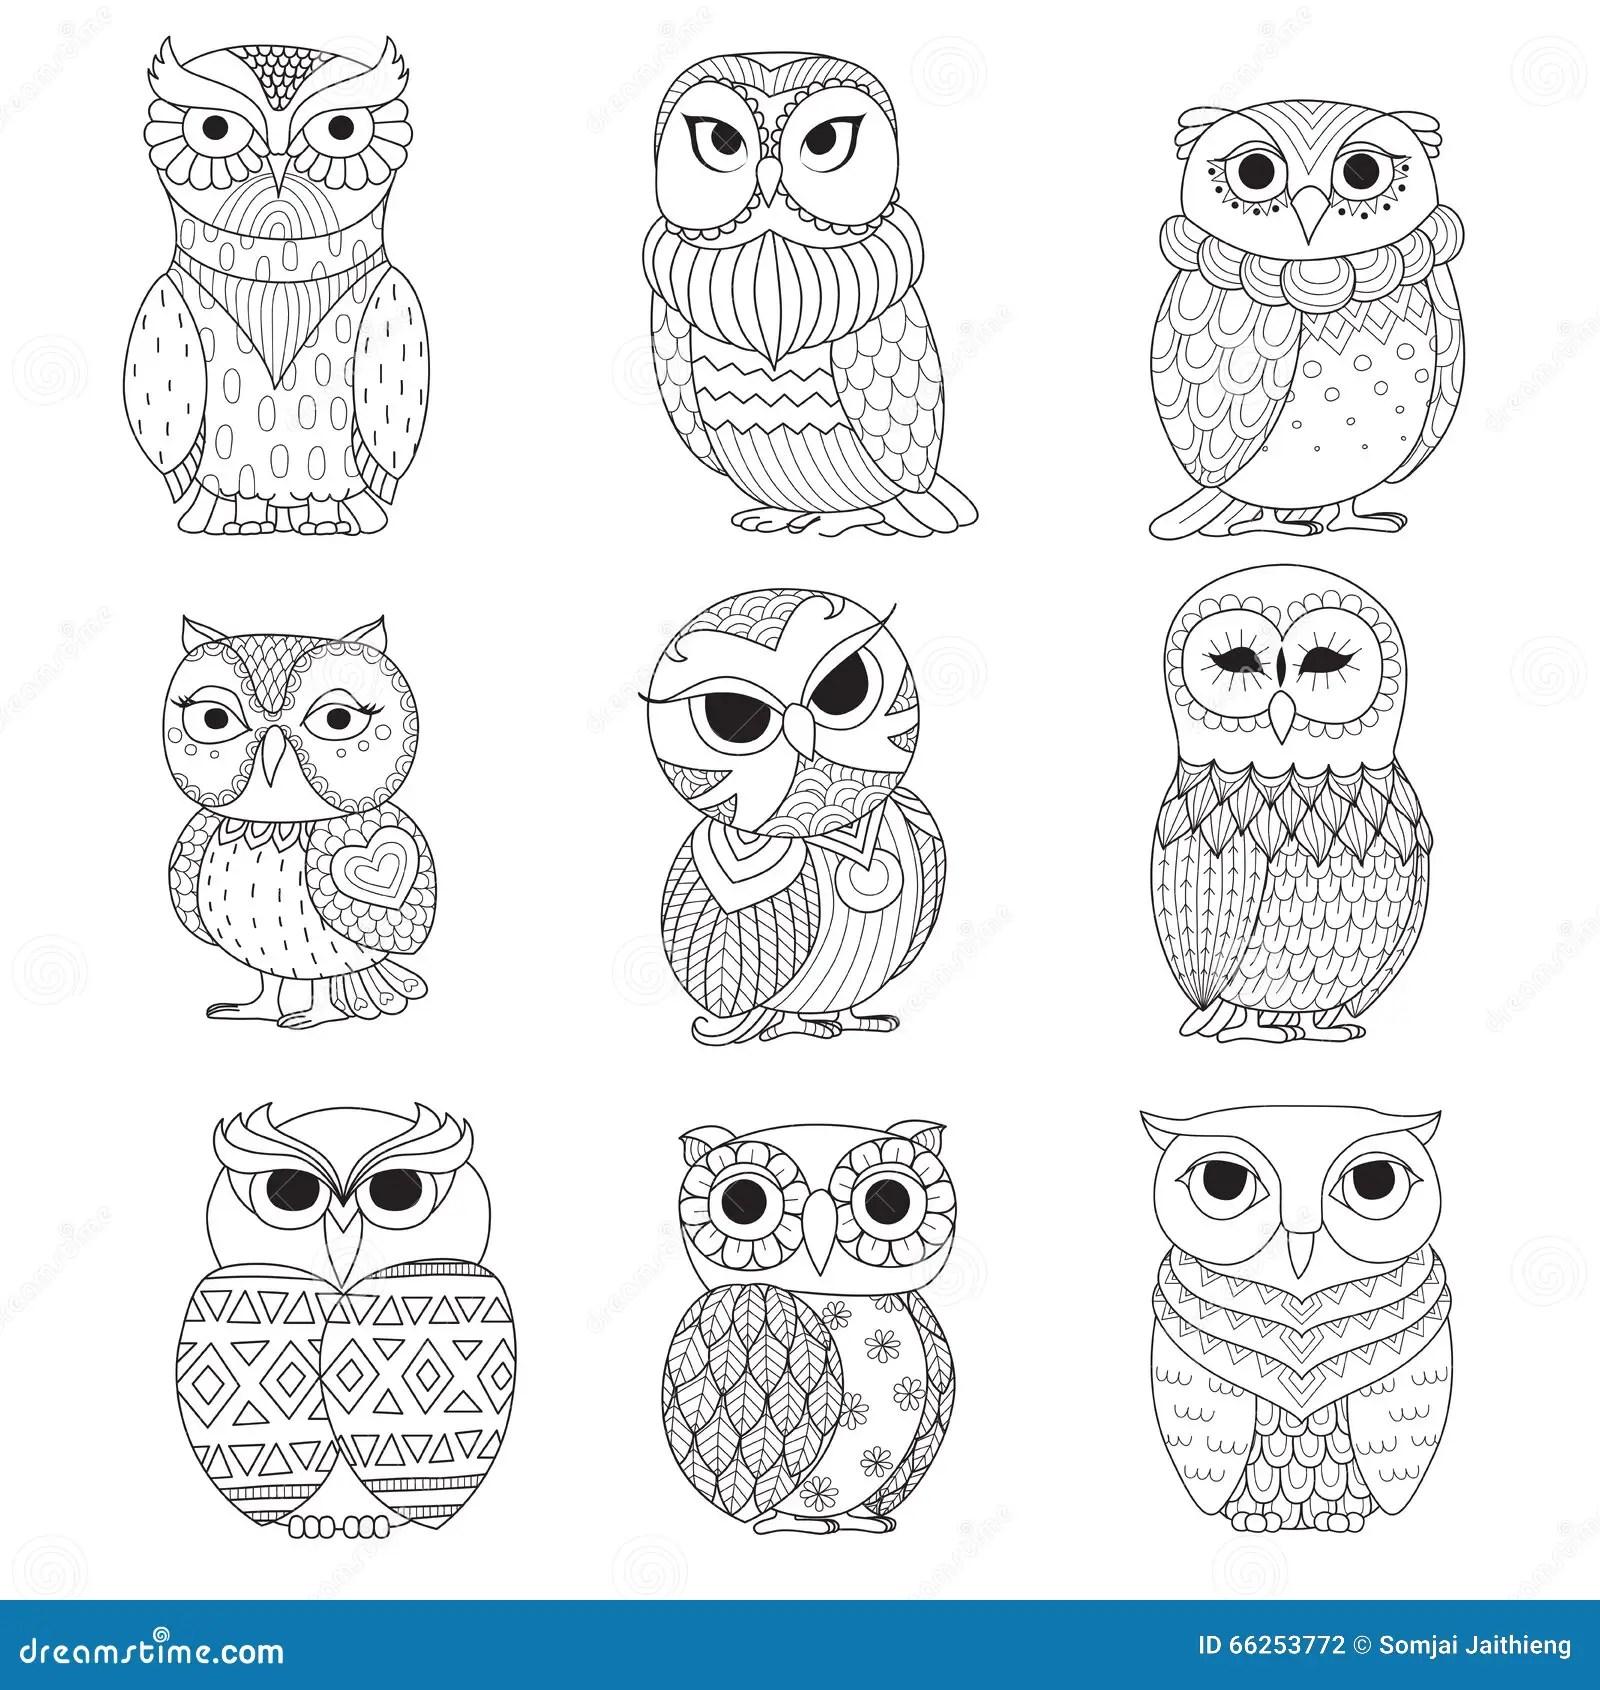 Nine Owls Design For Coloring Book, Tattoo, Shirt Design